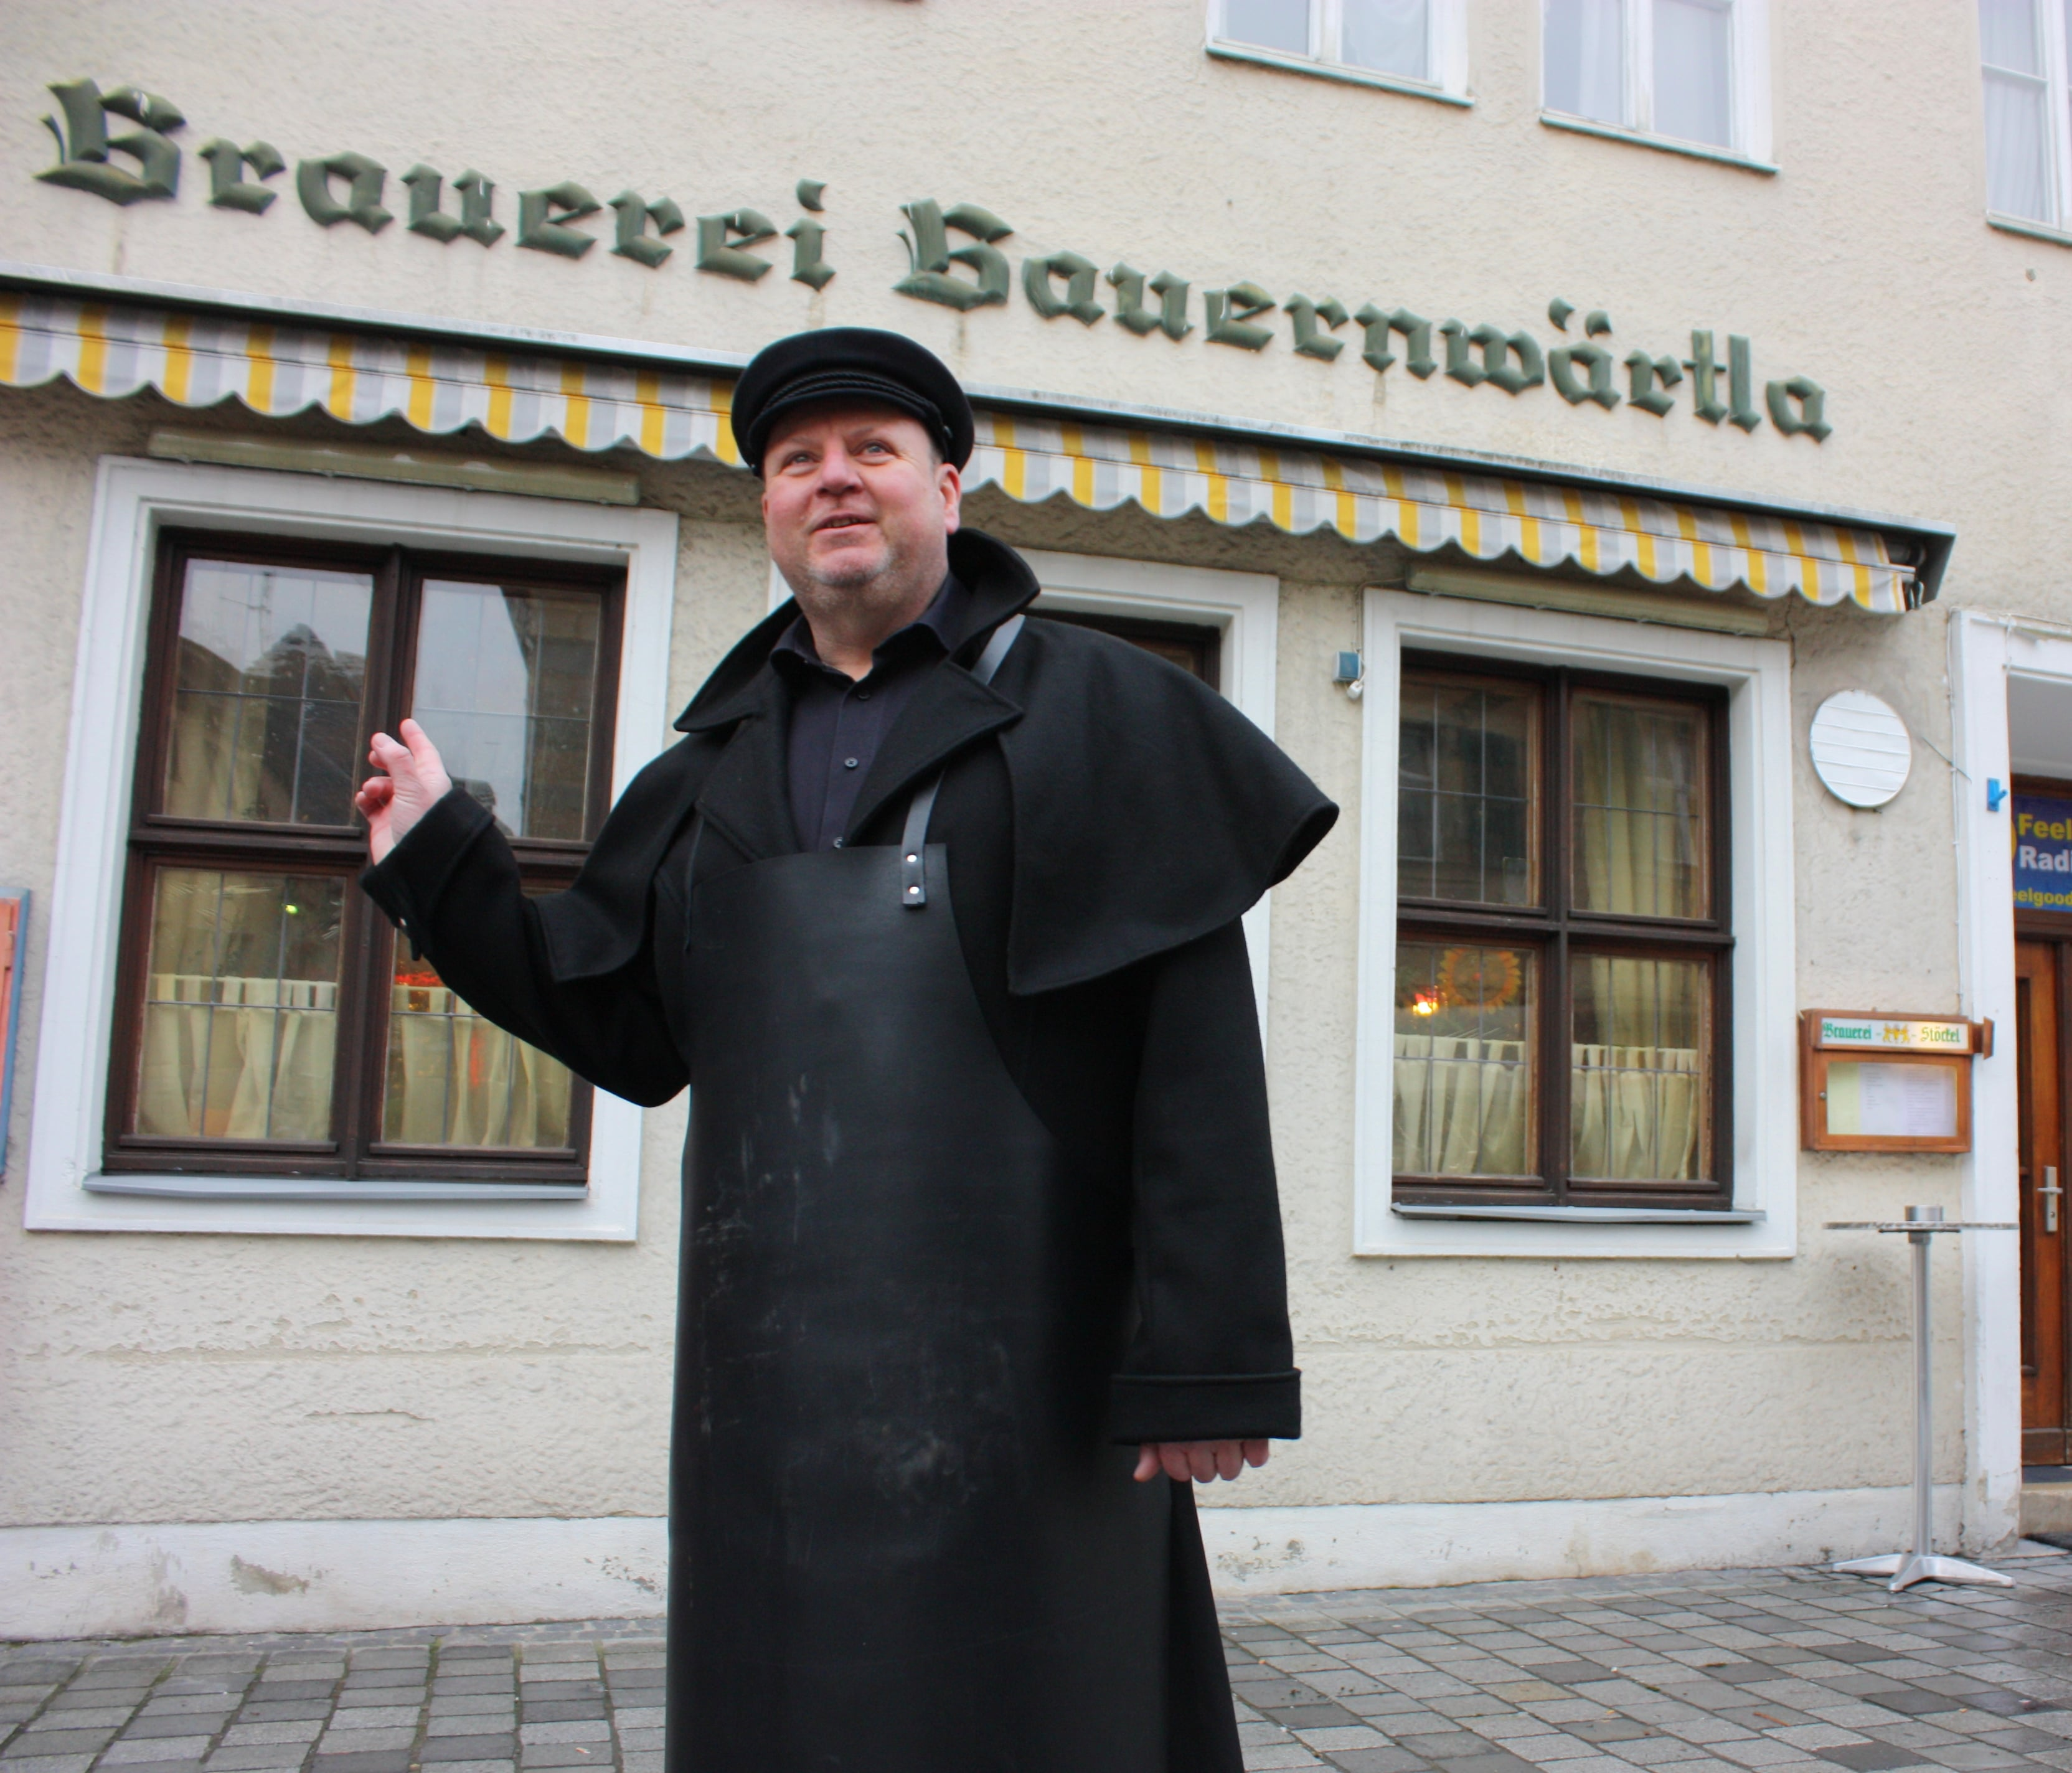 Bierkutscher6a